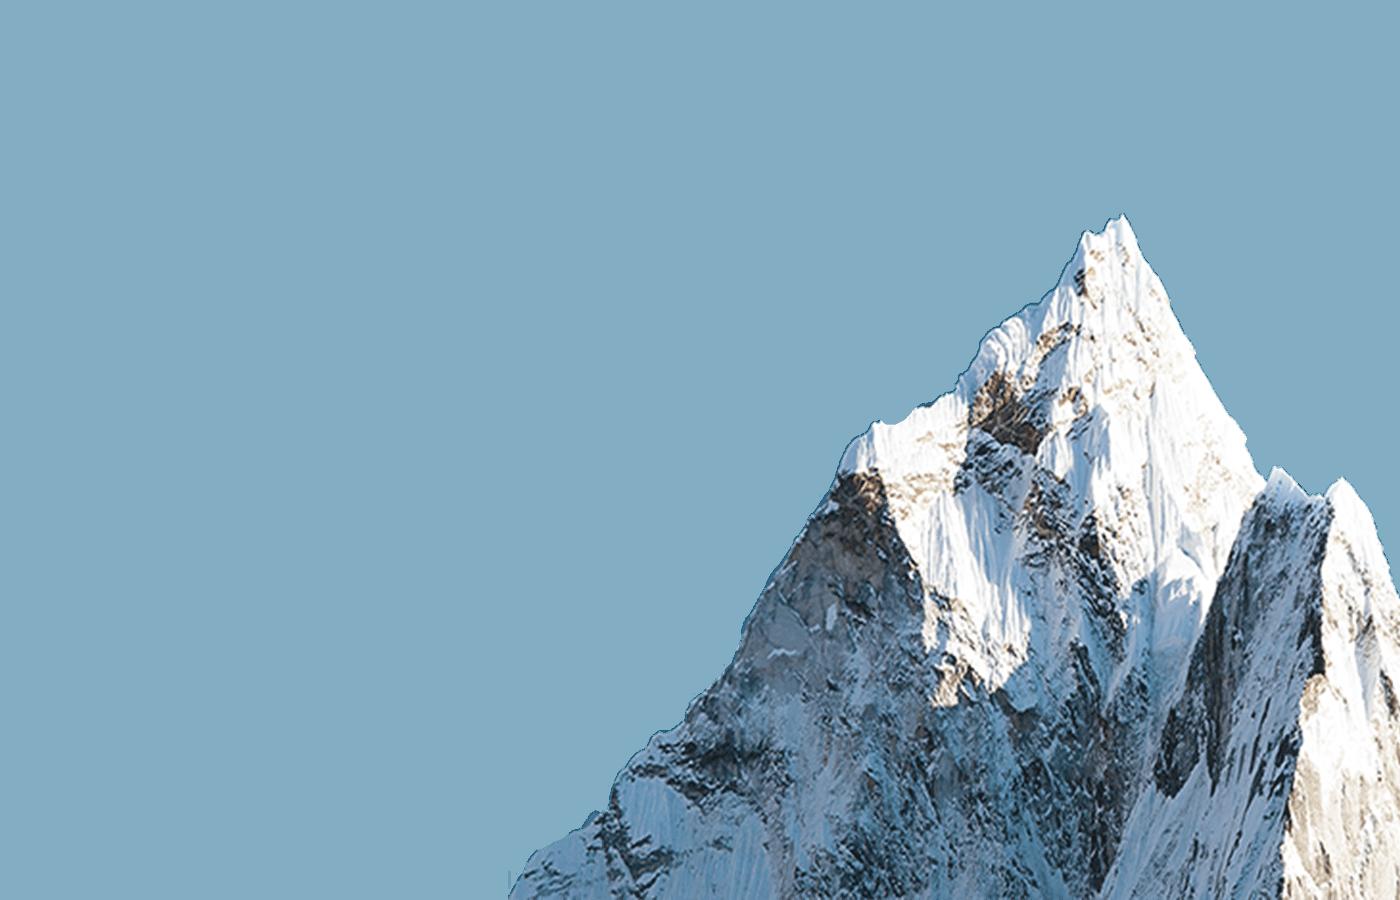 montagne droite lpa